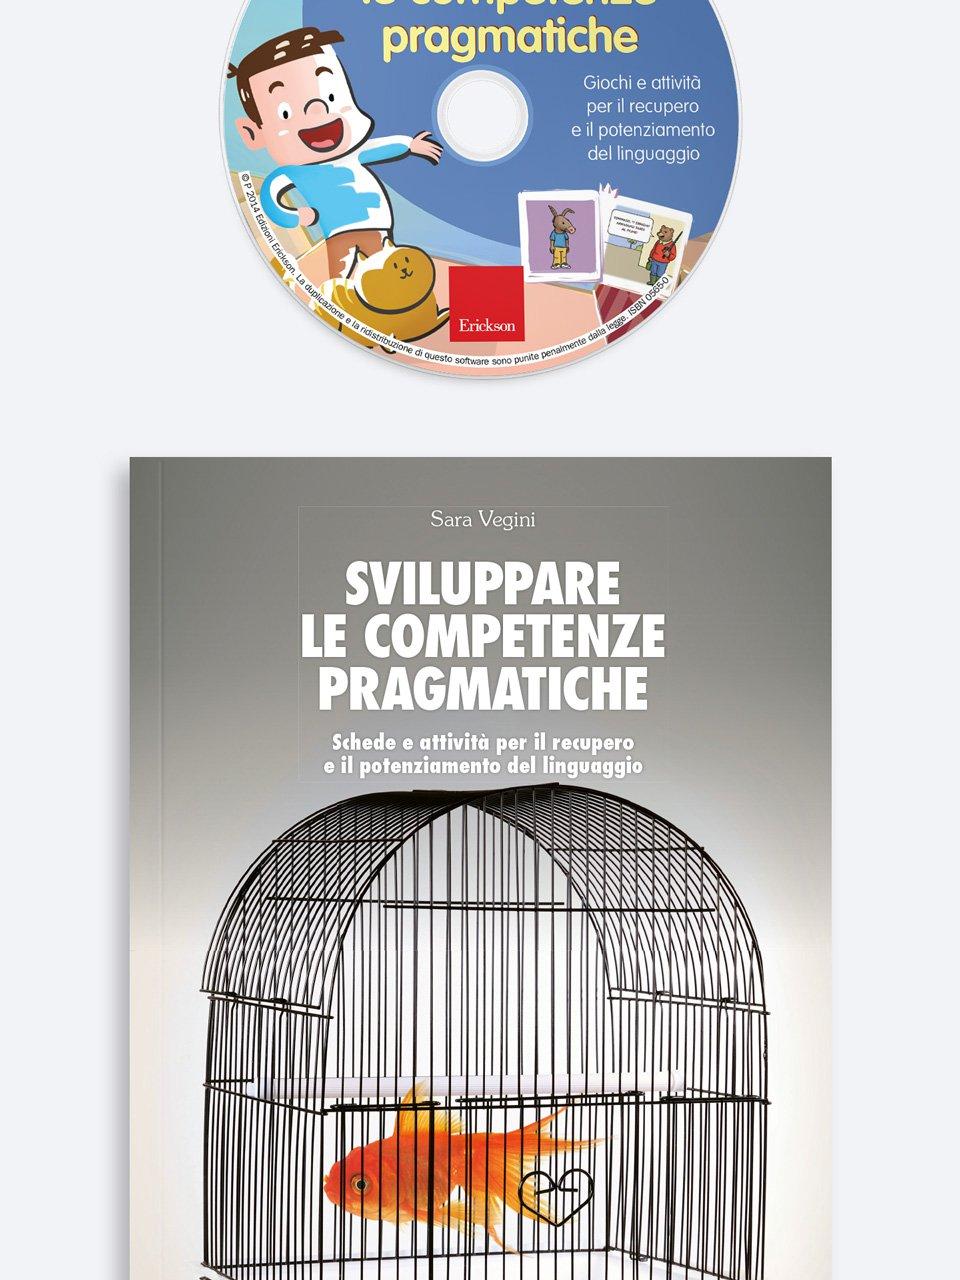 Sviluppare le competenze pragmatiche - Volume 1 - My First Word Games - App e software - Erickson 3